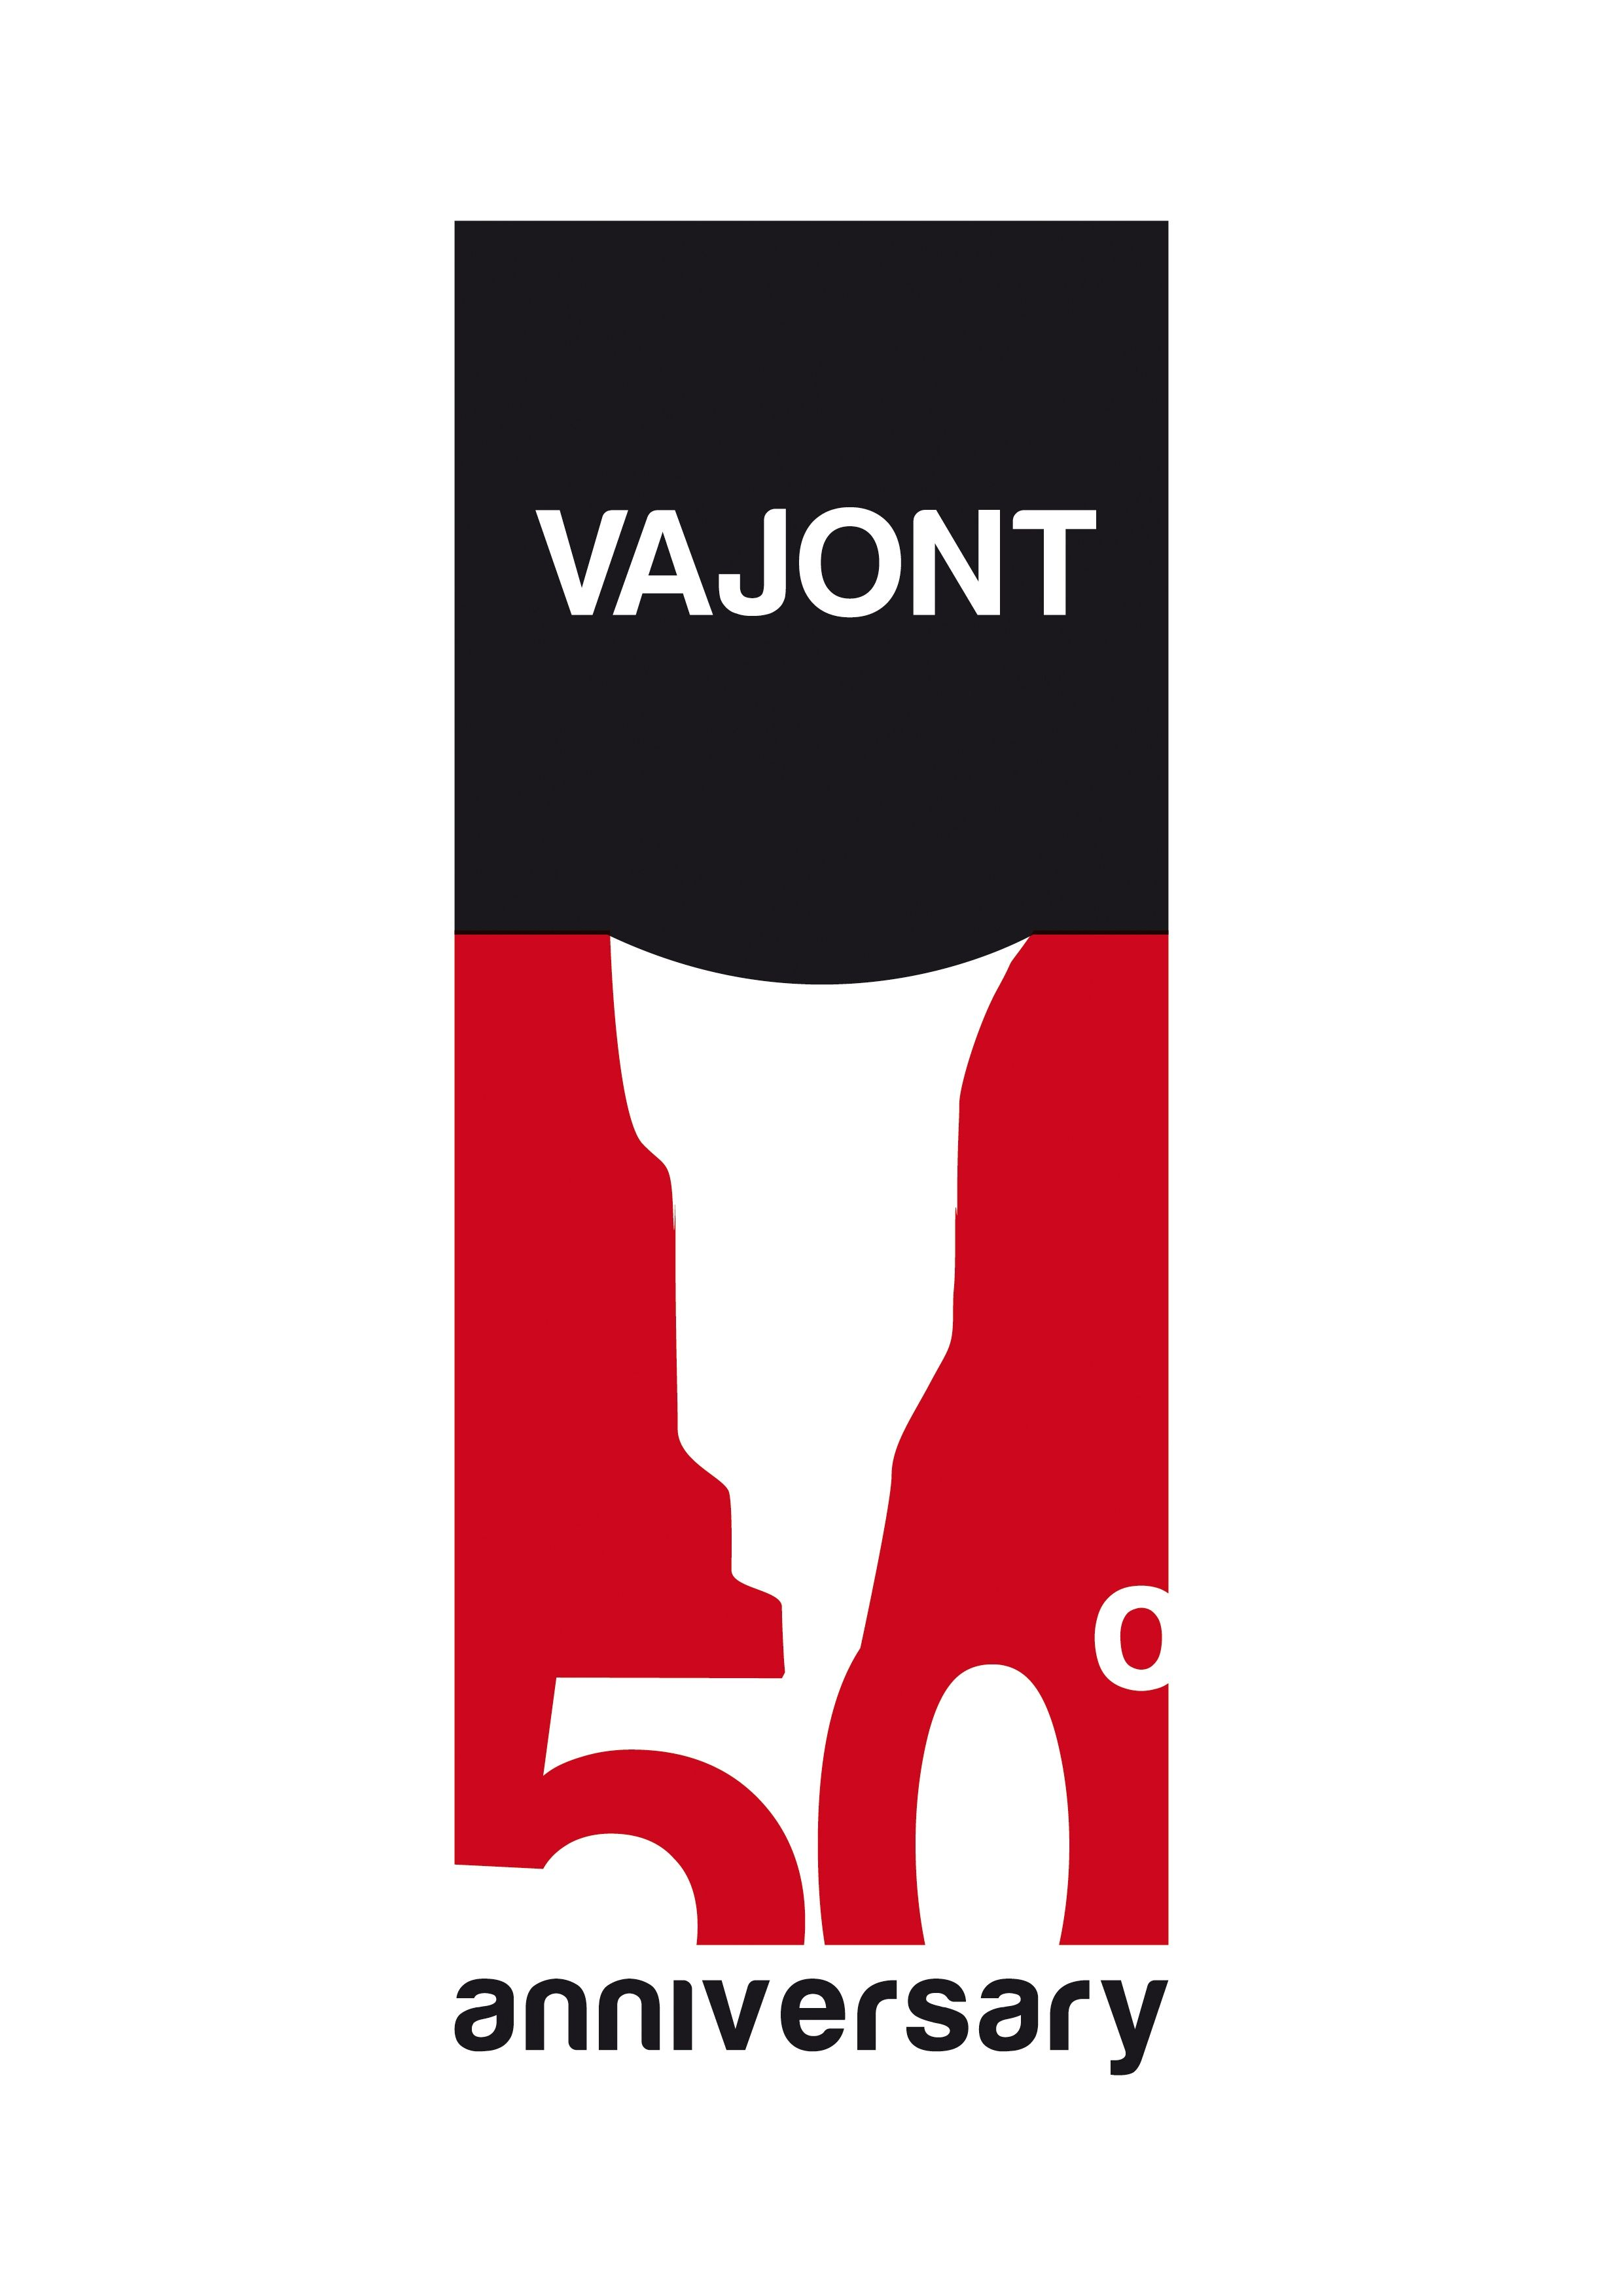 50 years of vajont dam tragedy italy anniversary logos rh pinterest com anniversary logos for companies anniversary logos inspiration